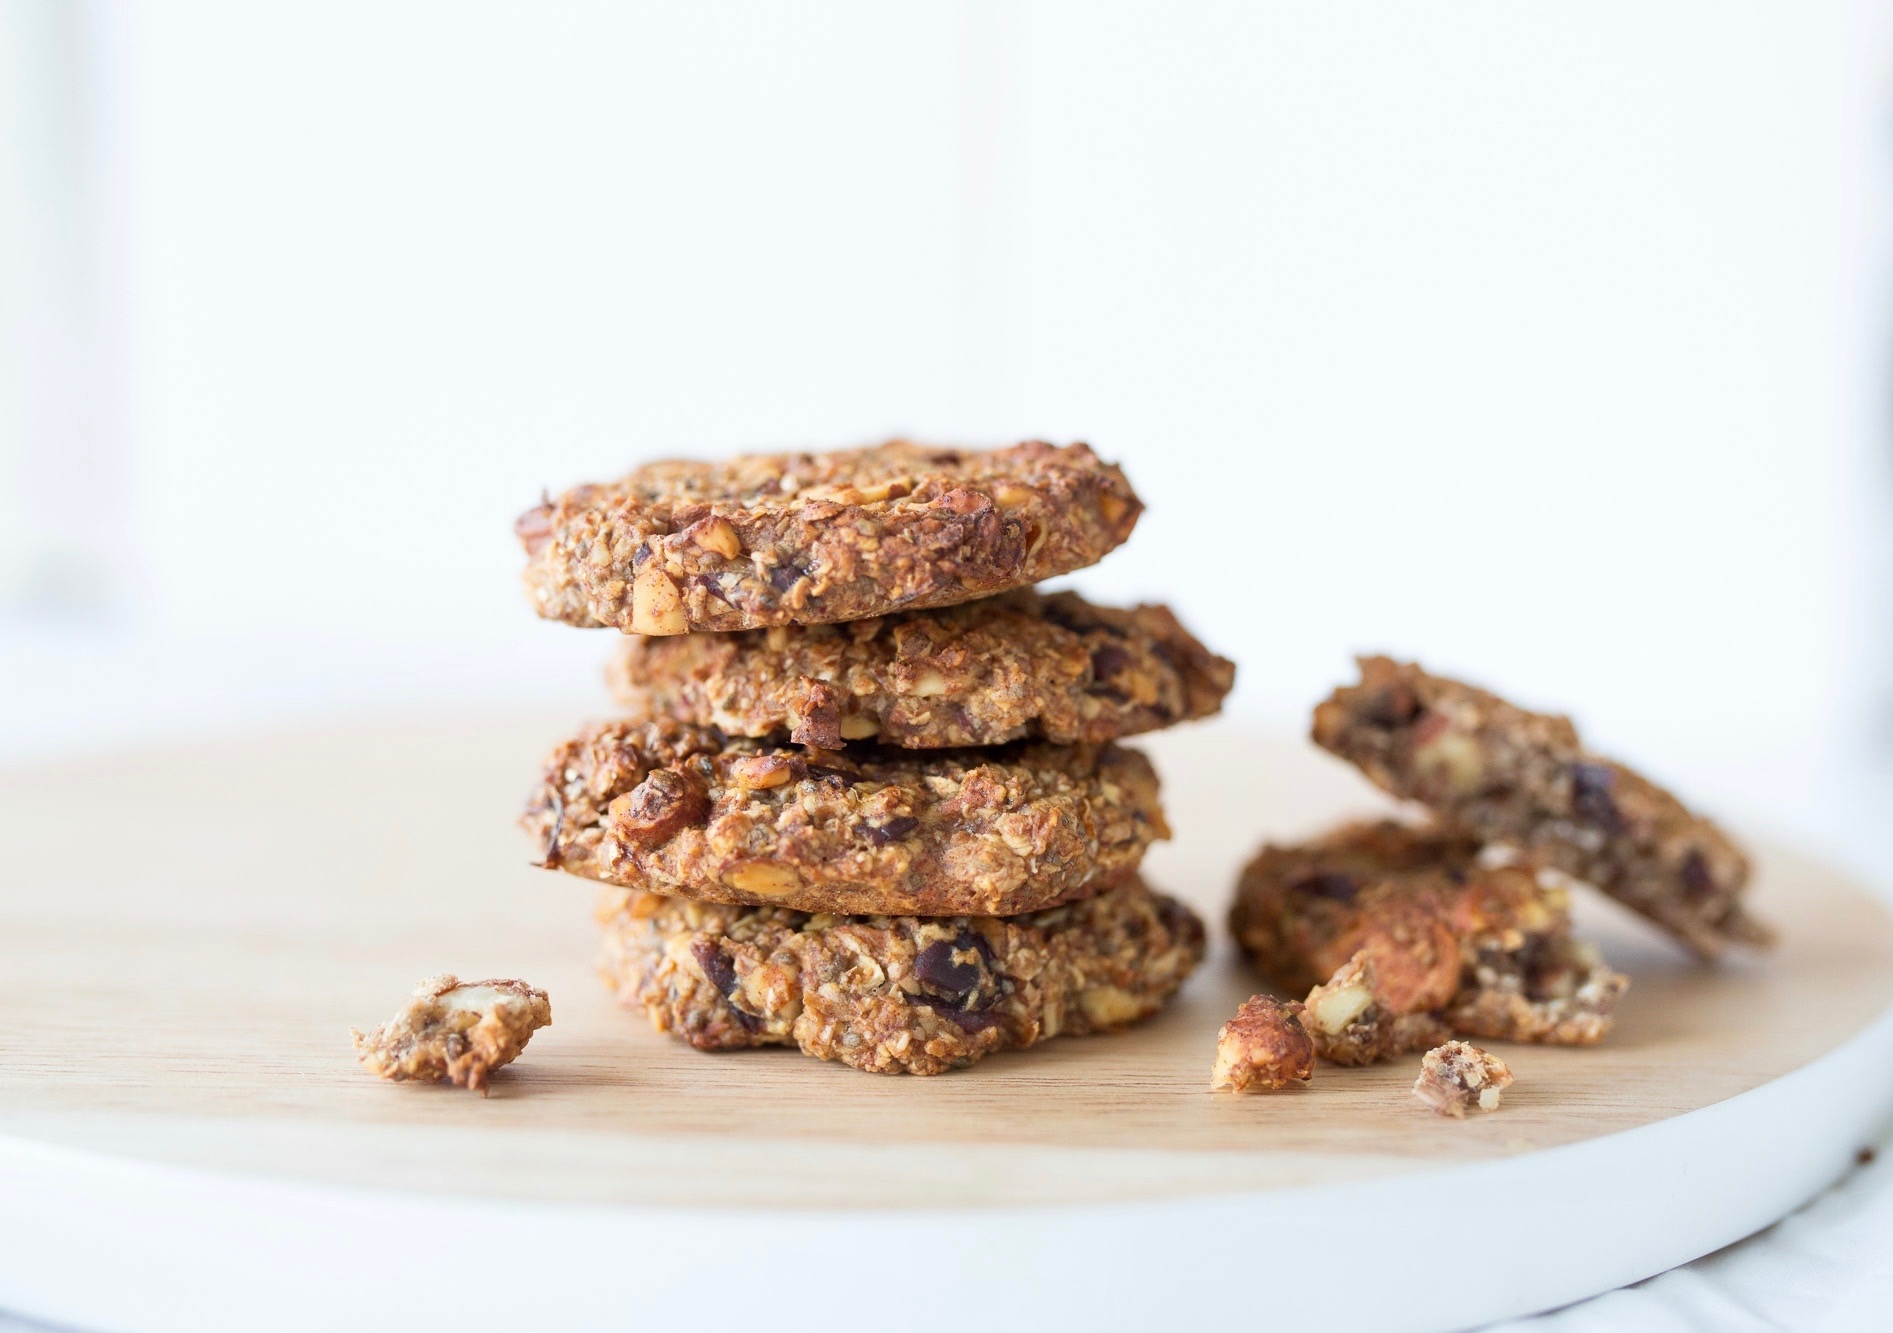 Nordic Honey_Breakfast Cookies with Dates, Almonds and Honey